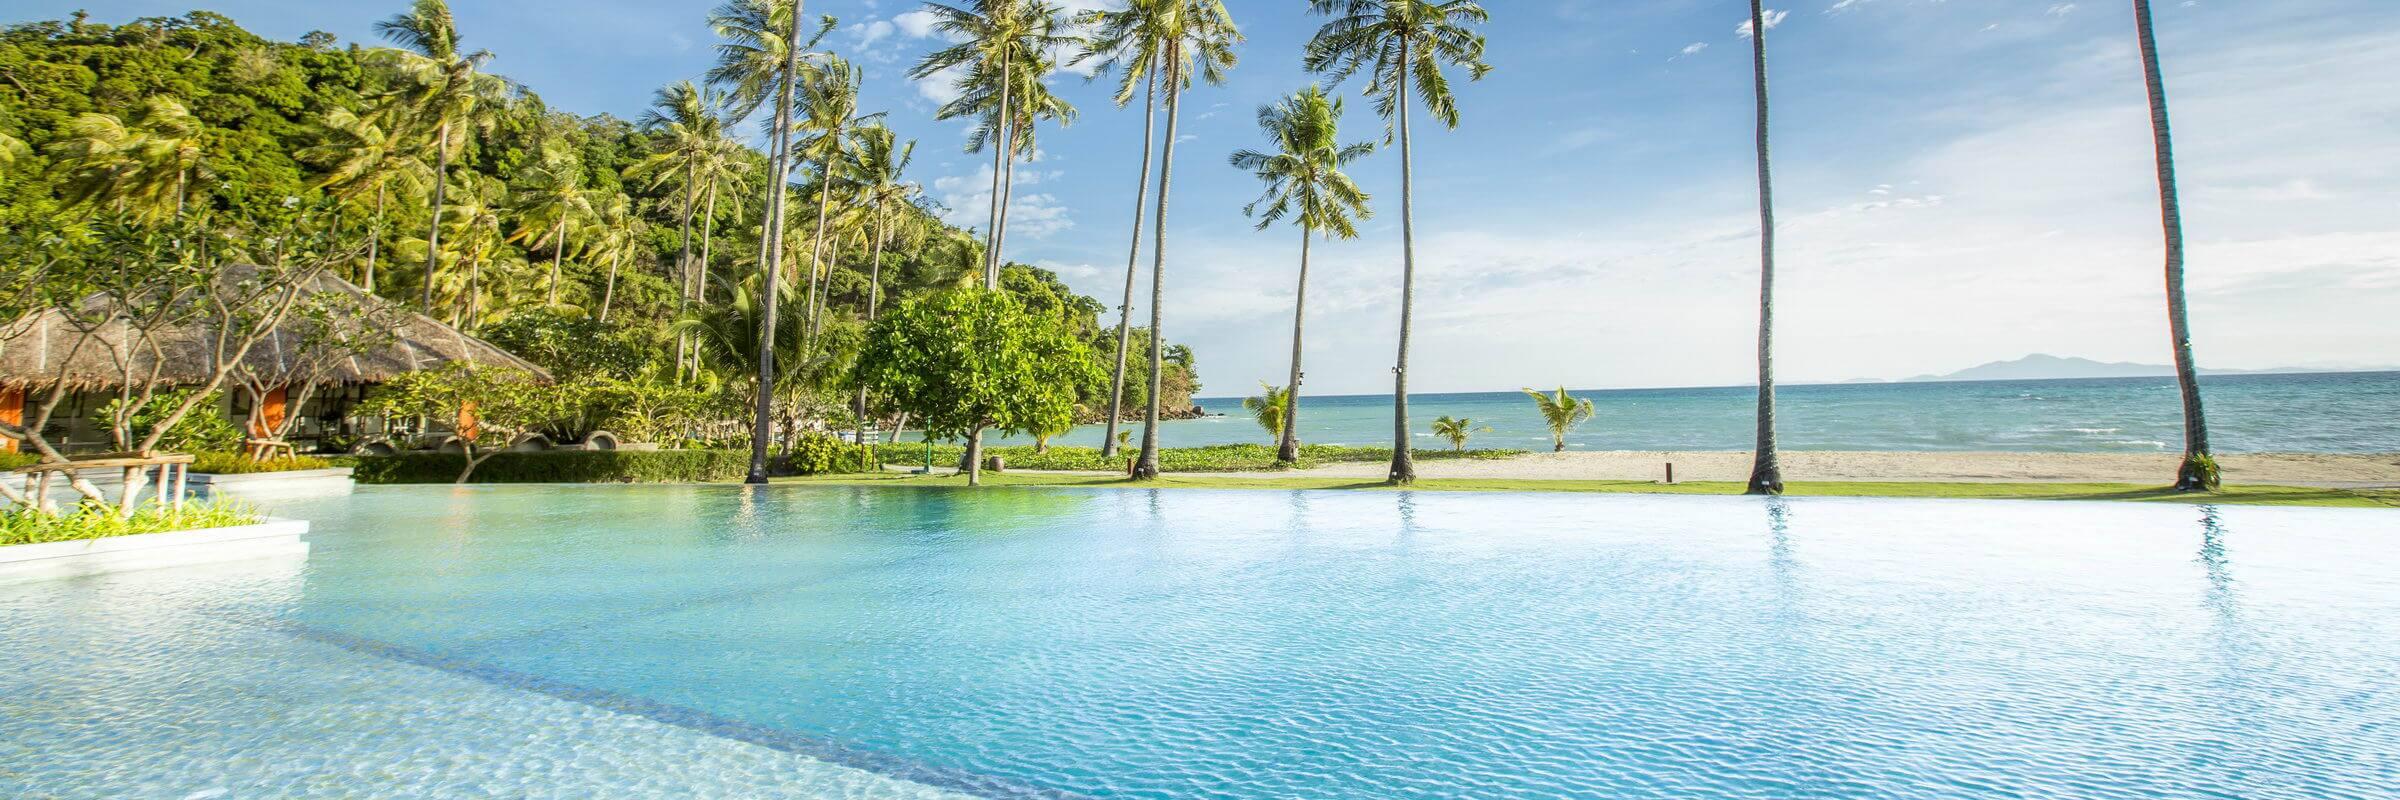 Atemberaubende Panoramasicht vom Infinity Pool im Phi Phi Island Village Beach Resort auf Koh Phi Phi